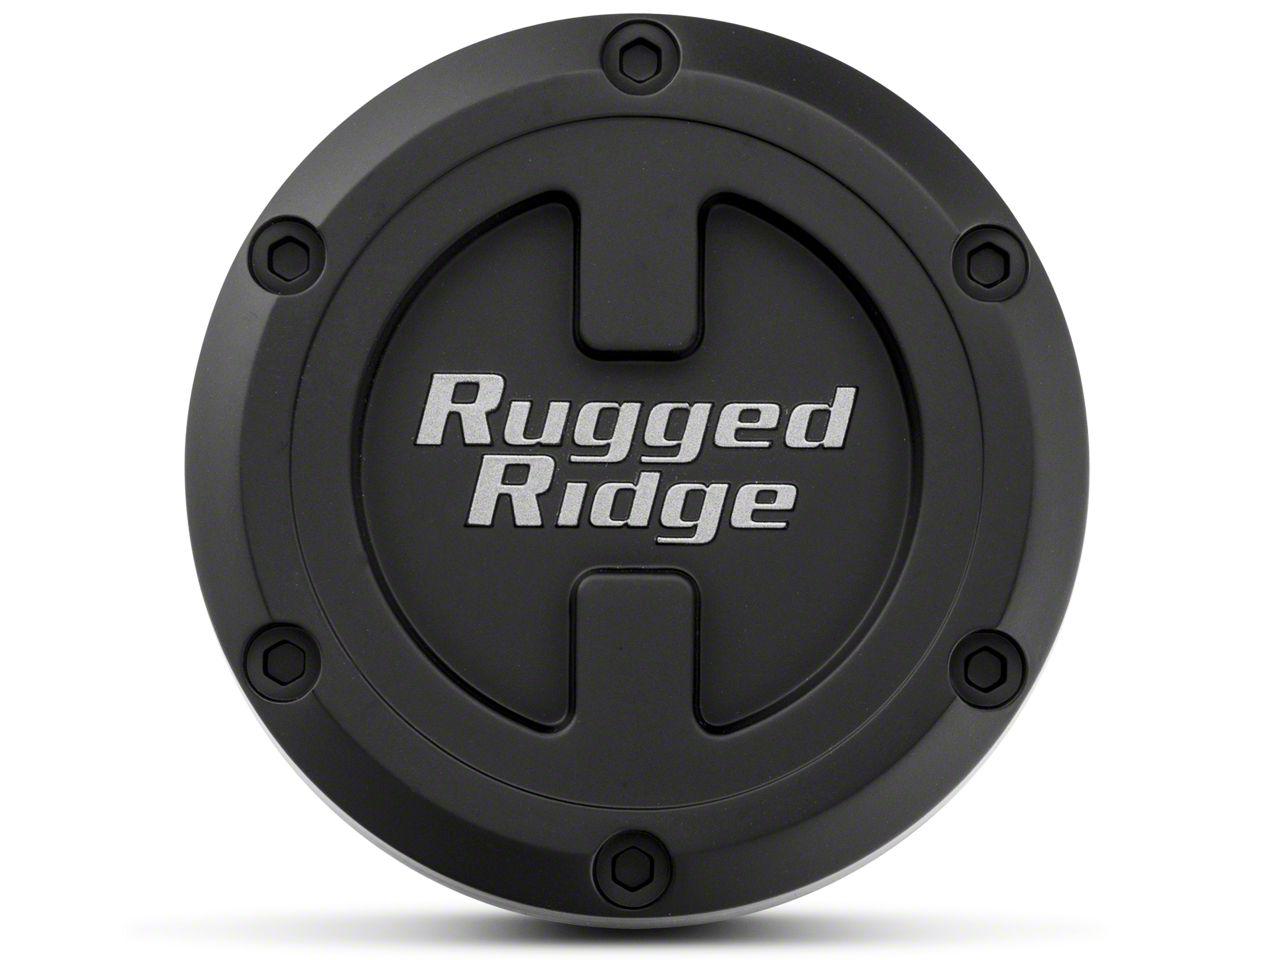 Rugged Ridge 17x9 XHD Wheel Center Cap - Black (07-18 Jeep Wrangler JK; 2018 Jeep Wrangler JL)